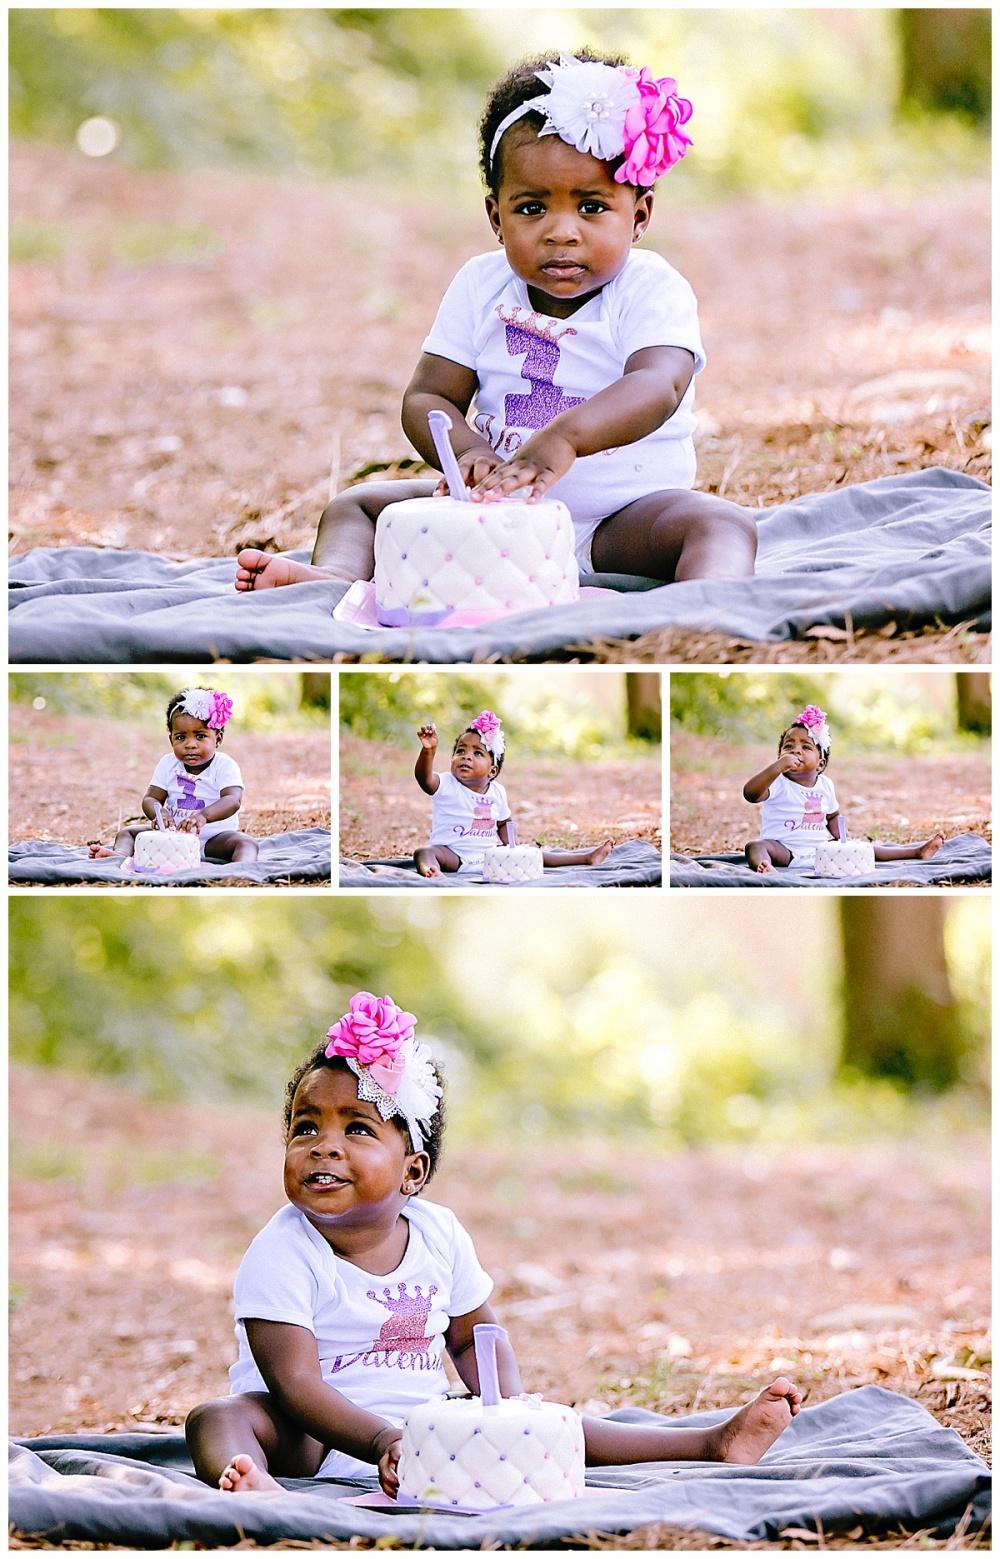 Carly-Barton-Photography-Family-Session-Kilgore-Texas-Twins-1-year-birthday-cake-smash-Olowo-family-photos_0026.jpg